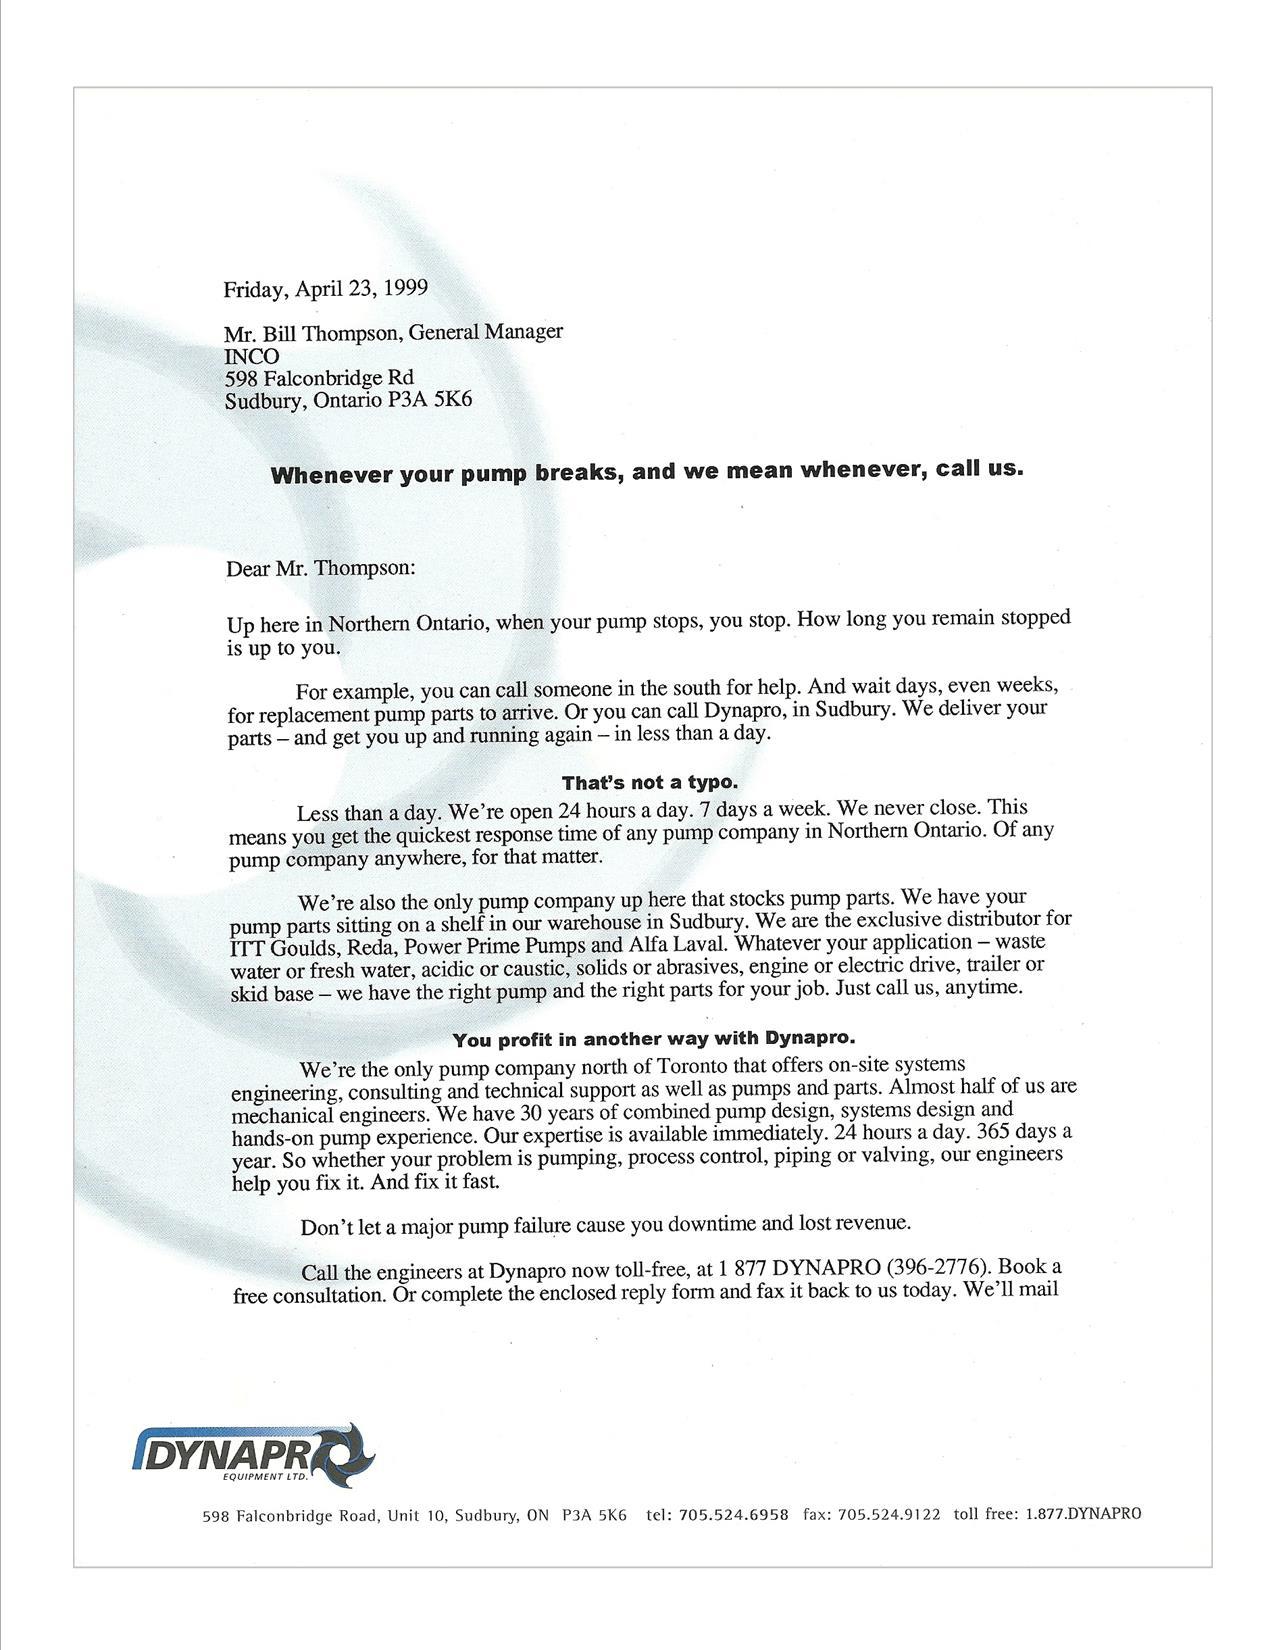 Web Copywriter Cover Letter - Trade support cover letter